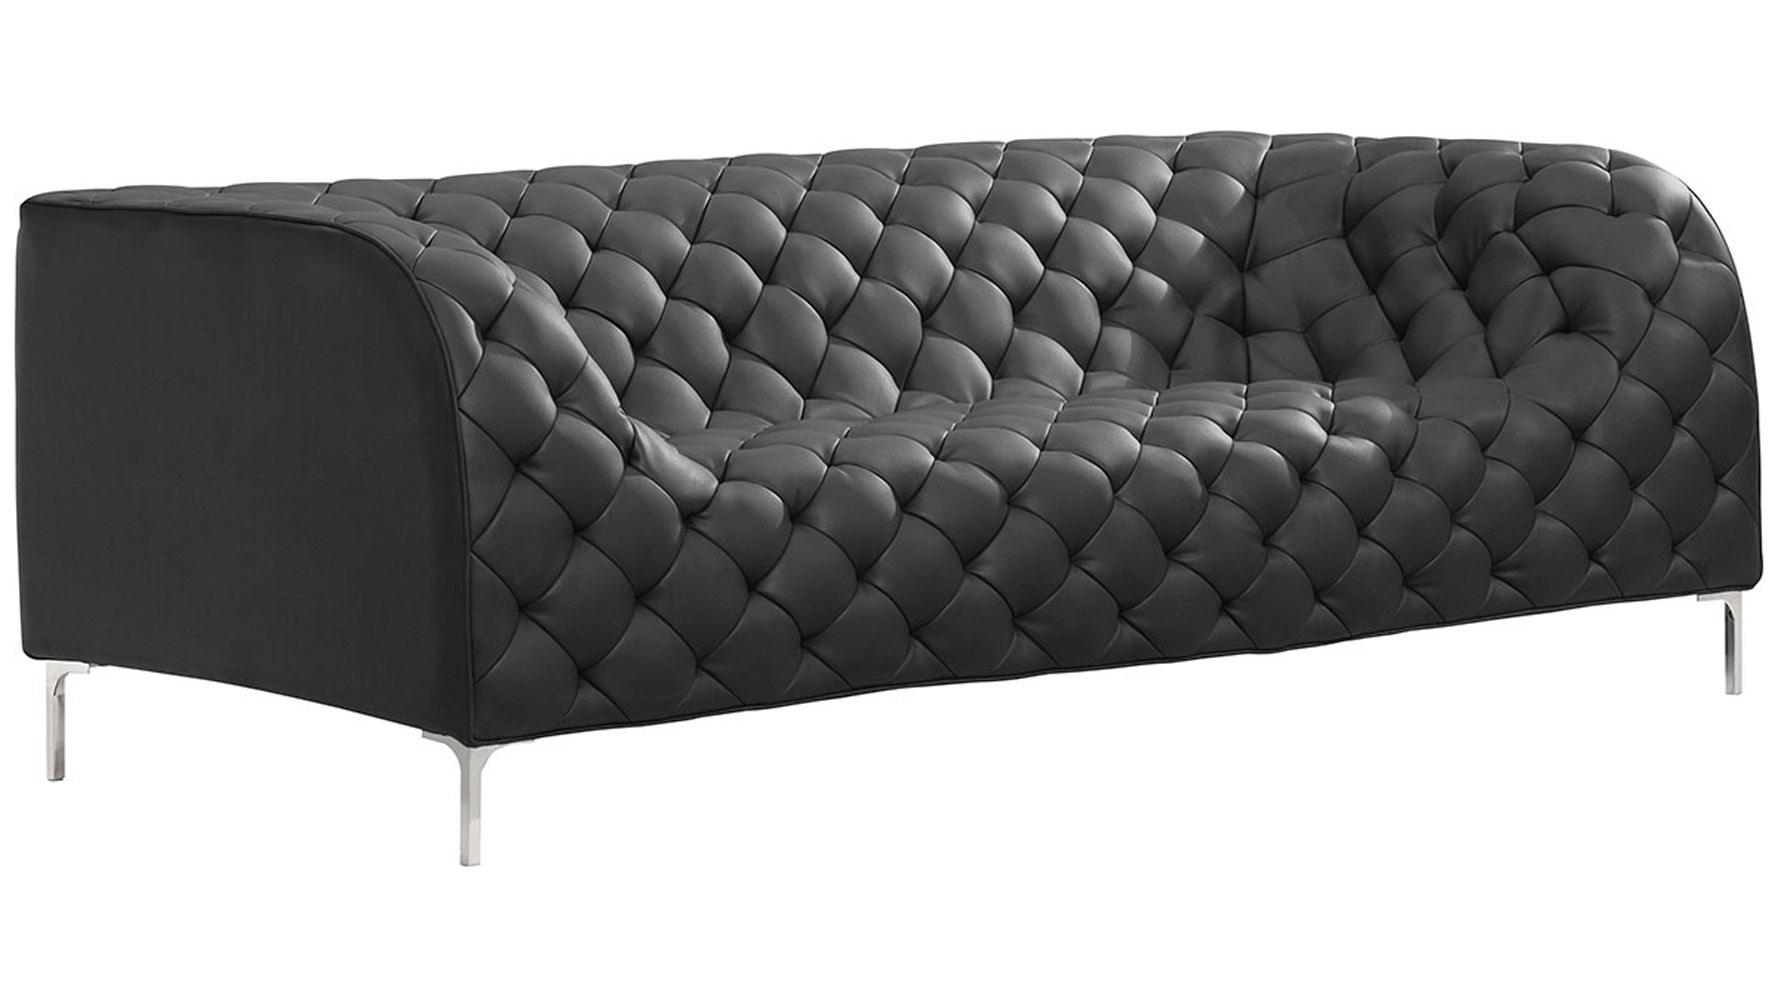 Elijah Sofa | Zuri Furniture With Sofas With Chrome Legs (Image 8 of 20)